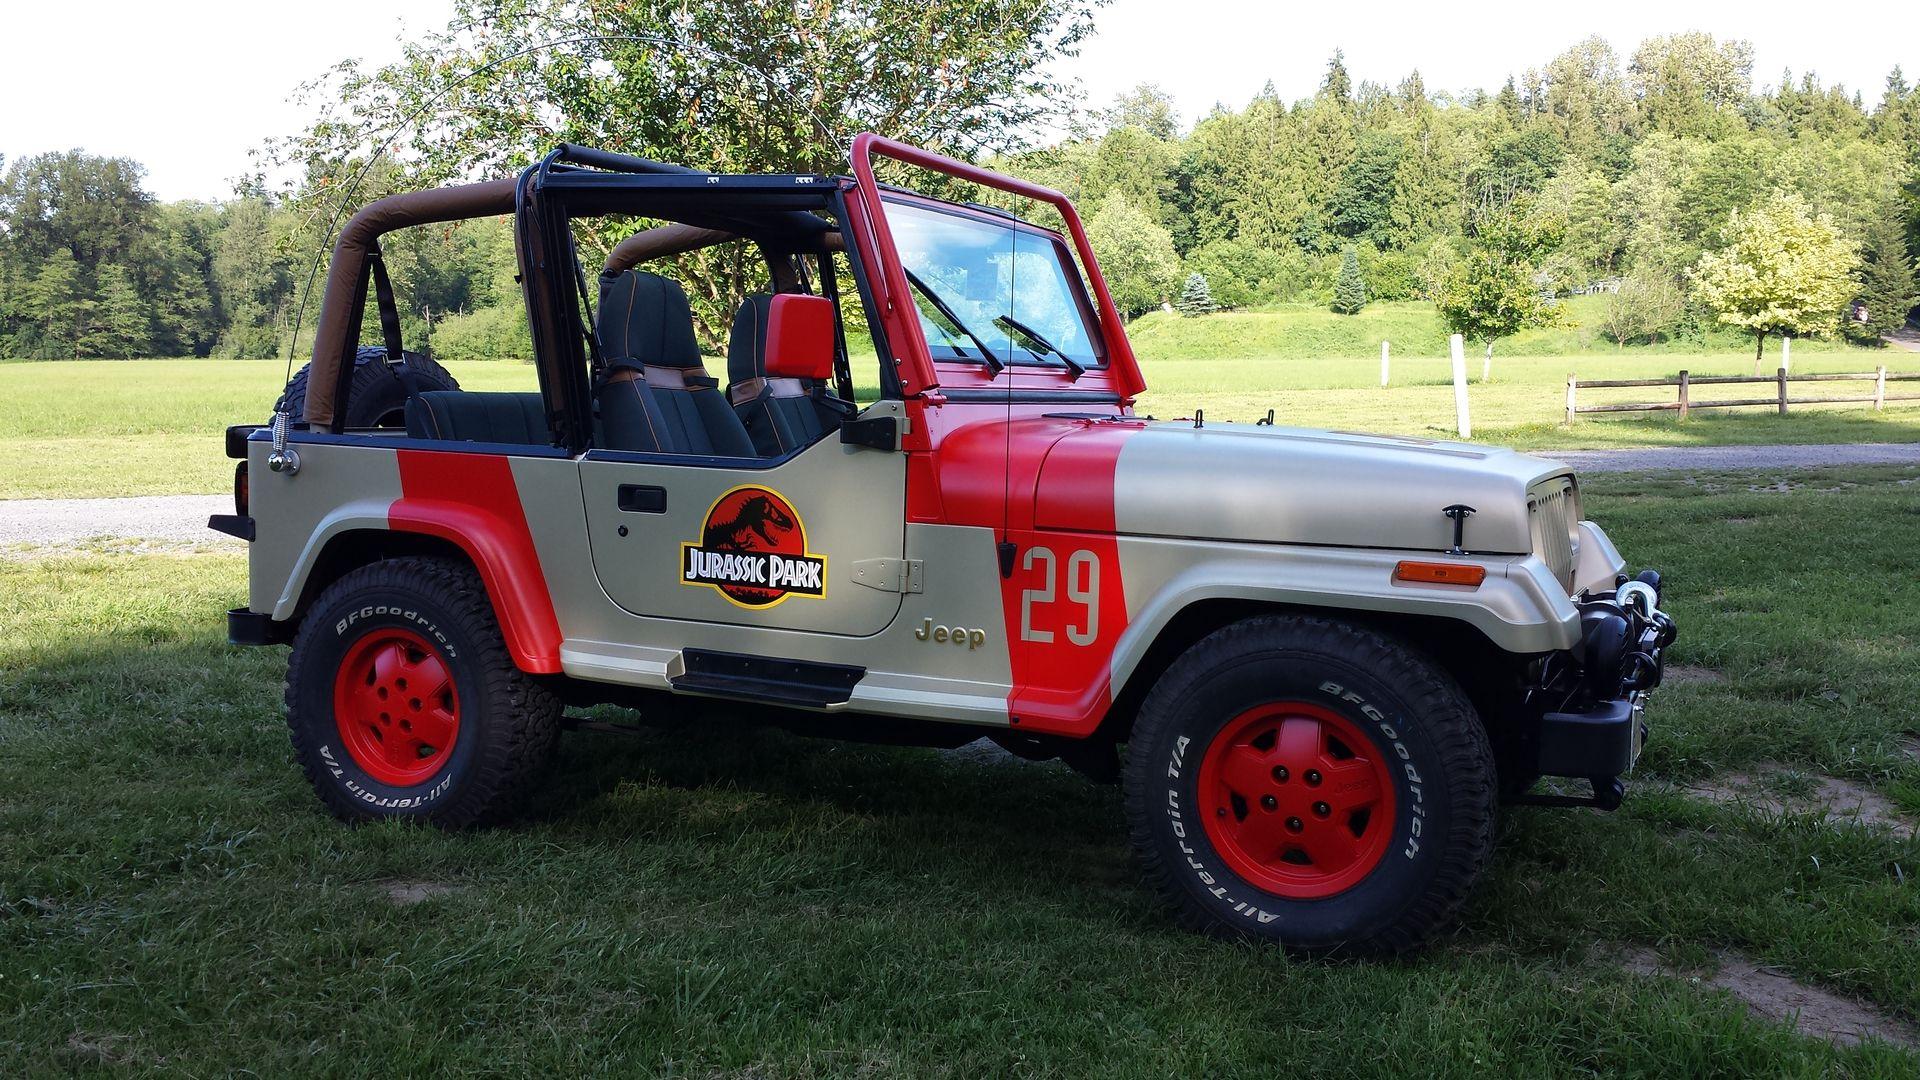 Jurassic Park Jeep Rental For Party Jurassic Park Jeep Jeep